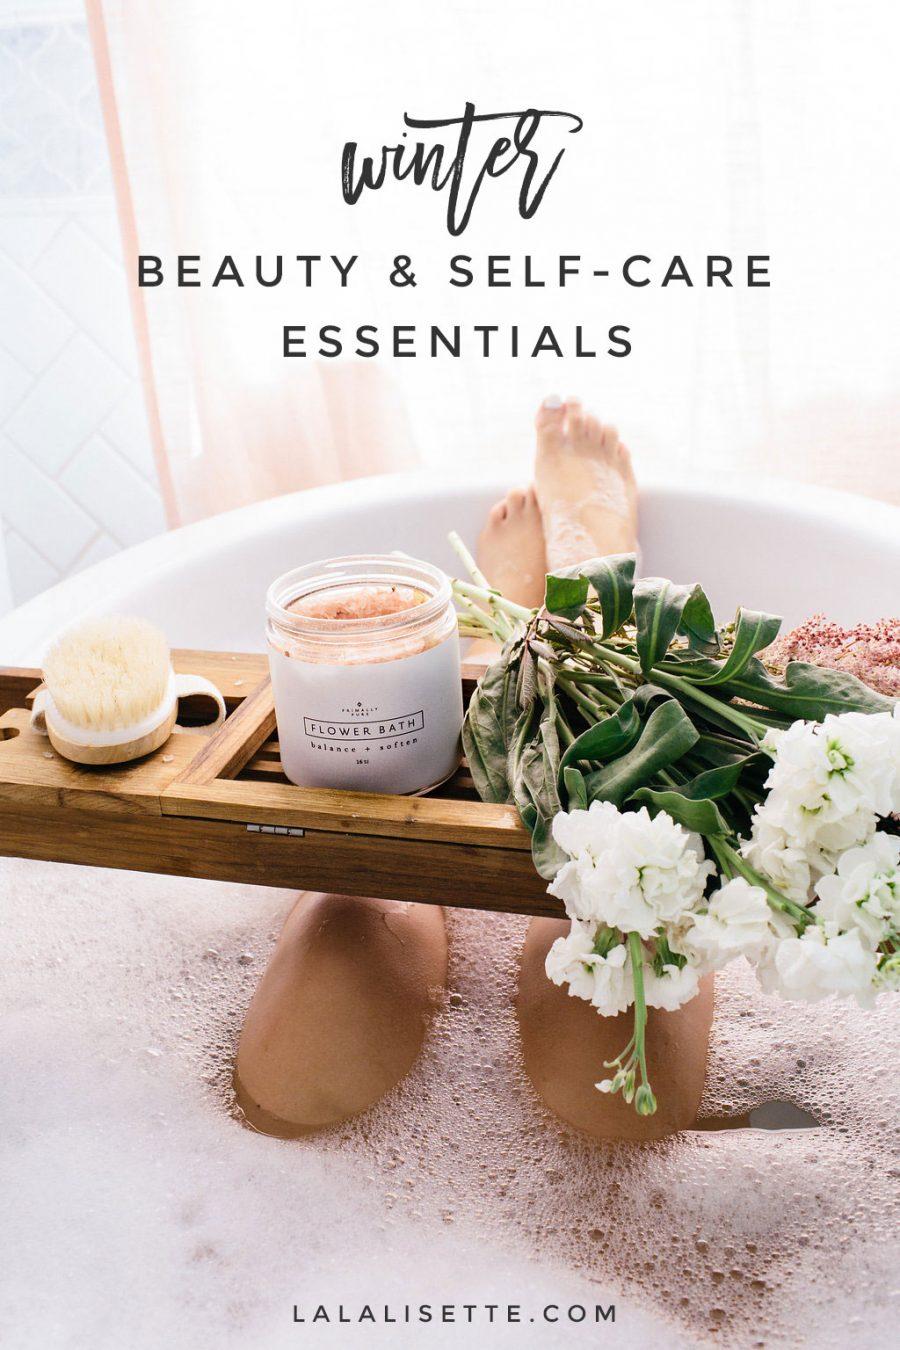 Winter Beauty & Self-Care Essentials #selfcare #saferbeauty #cleanbeauty #beautycounter